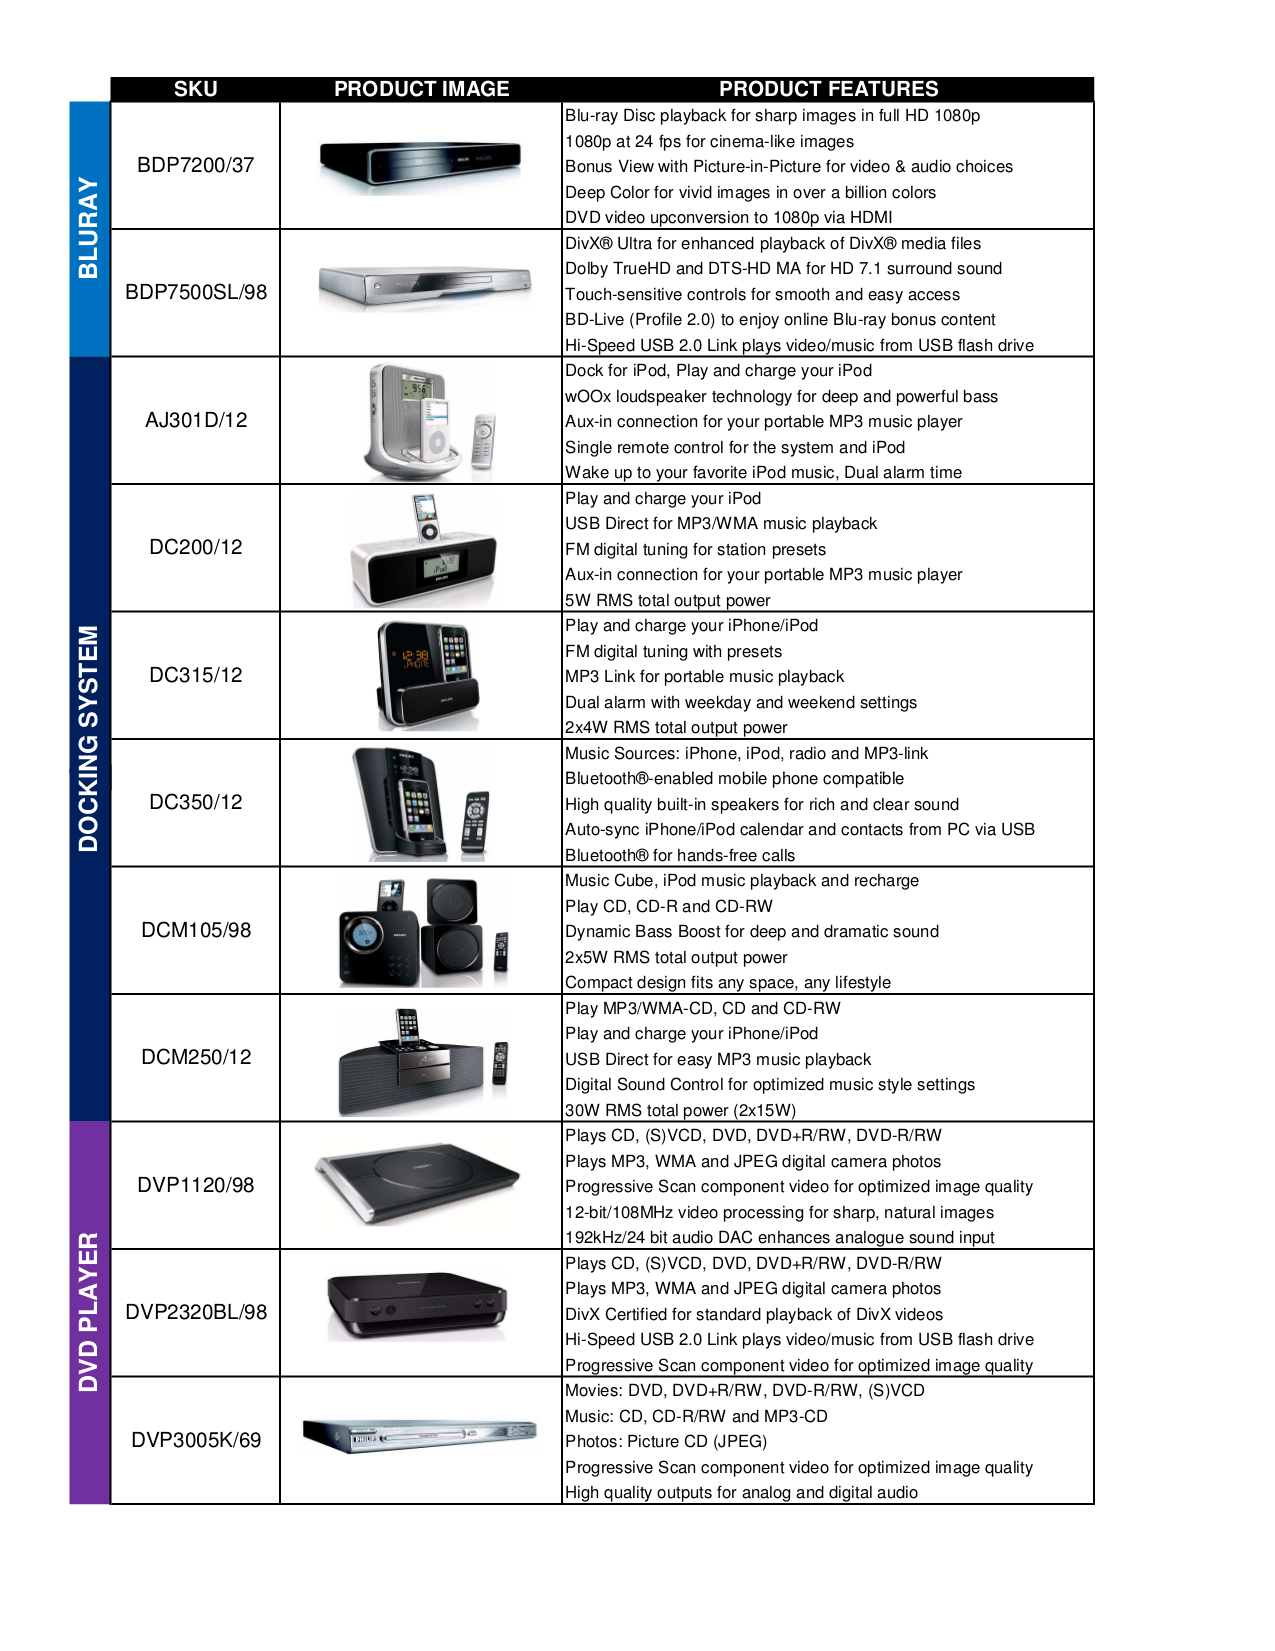 Philips Dc315 Manual Pdf Ebook Ducati E900 Cagiva Elefant Wiring Diagram Data Source Array For Mp3 Player Gogear Sa3015 Rh Umlib Com